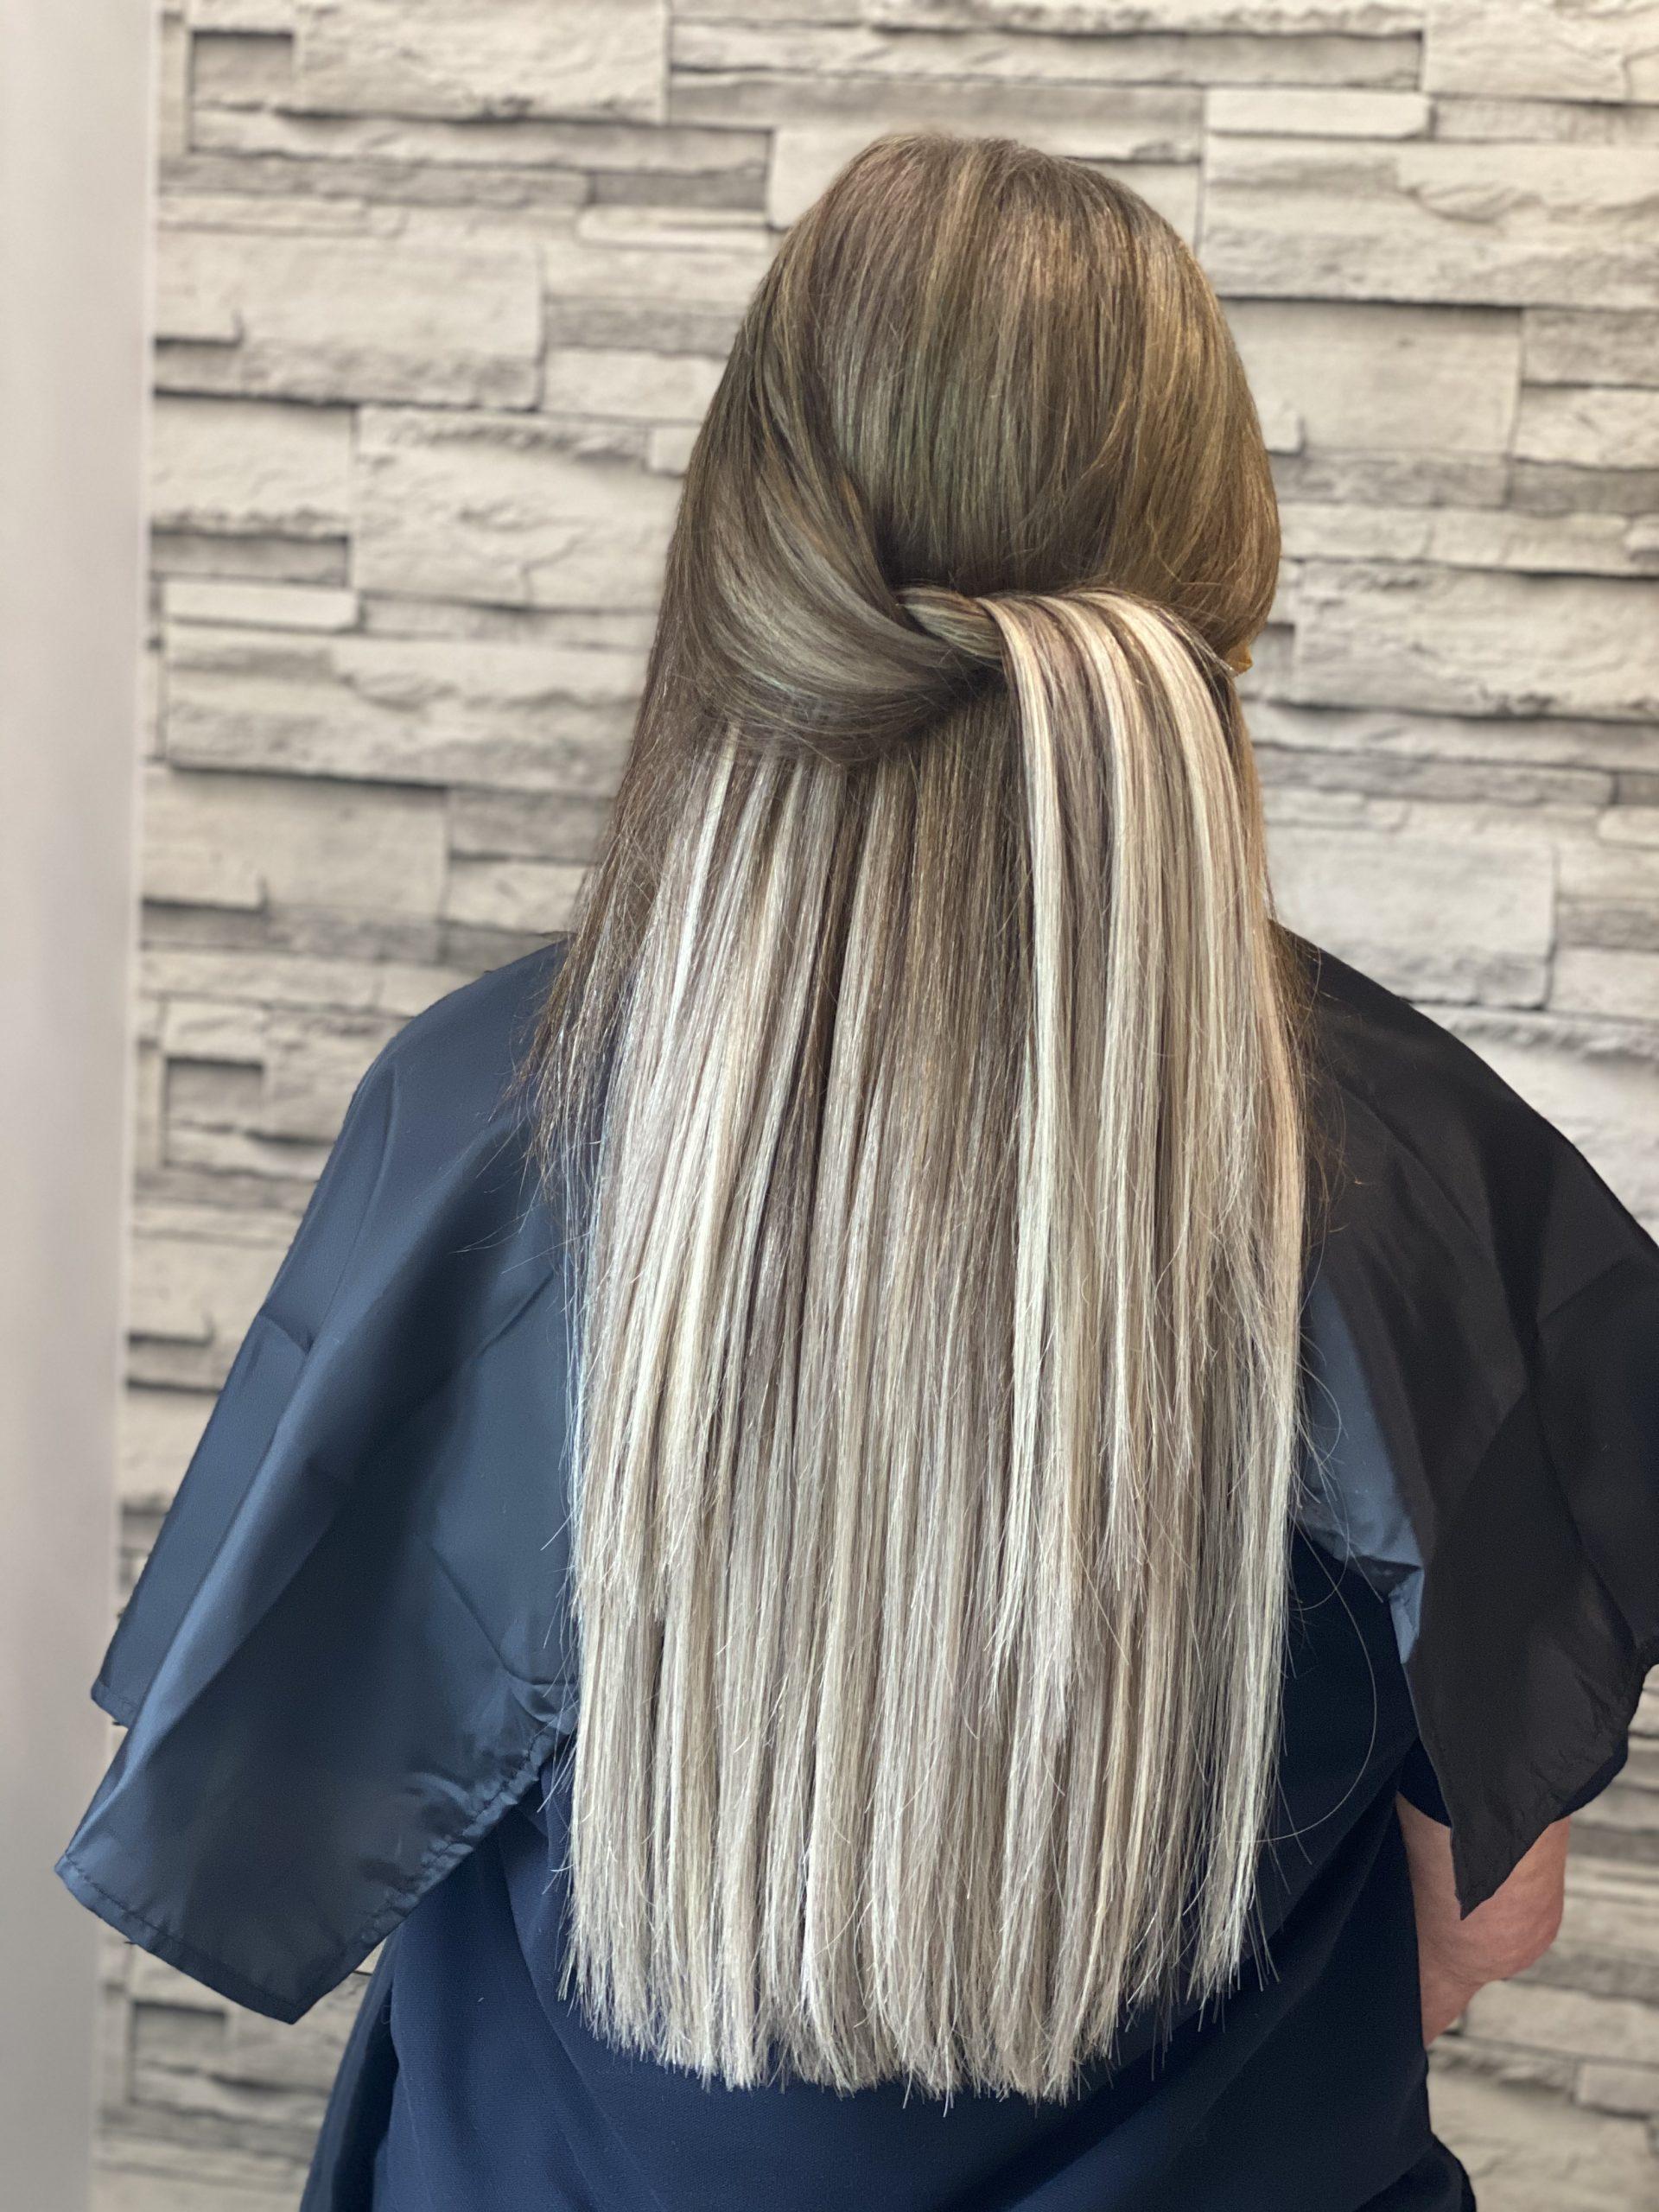 Balyage hair extensions